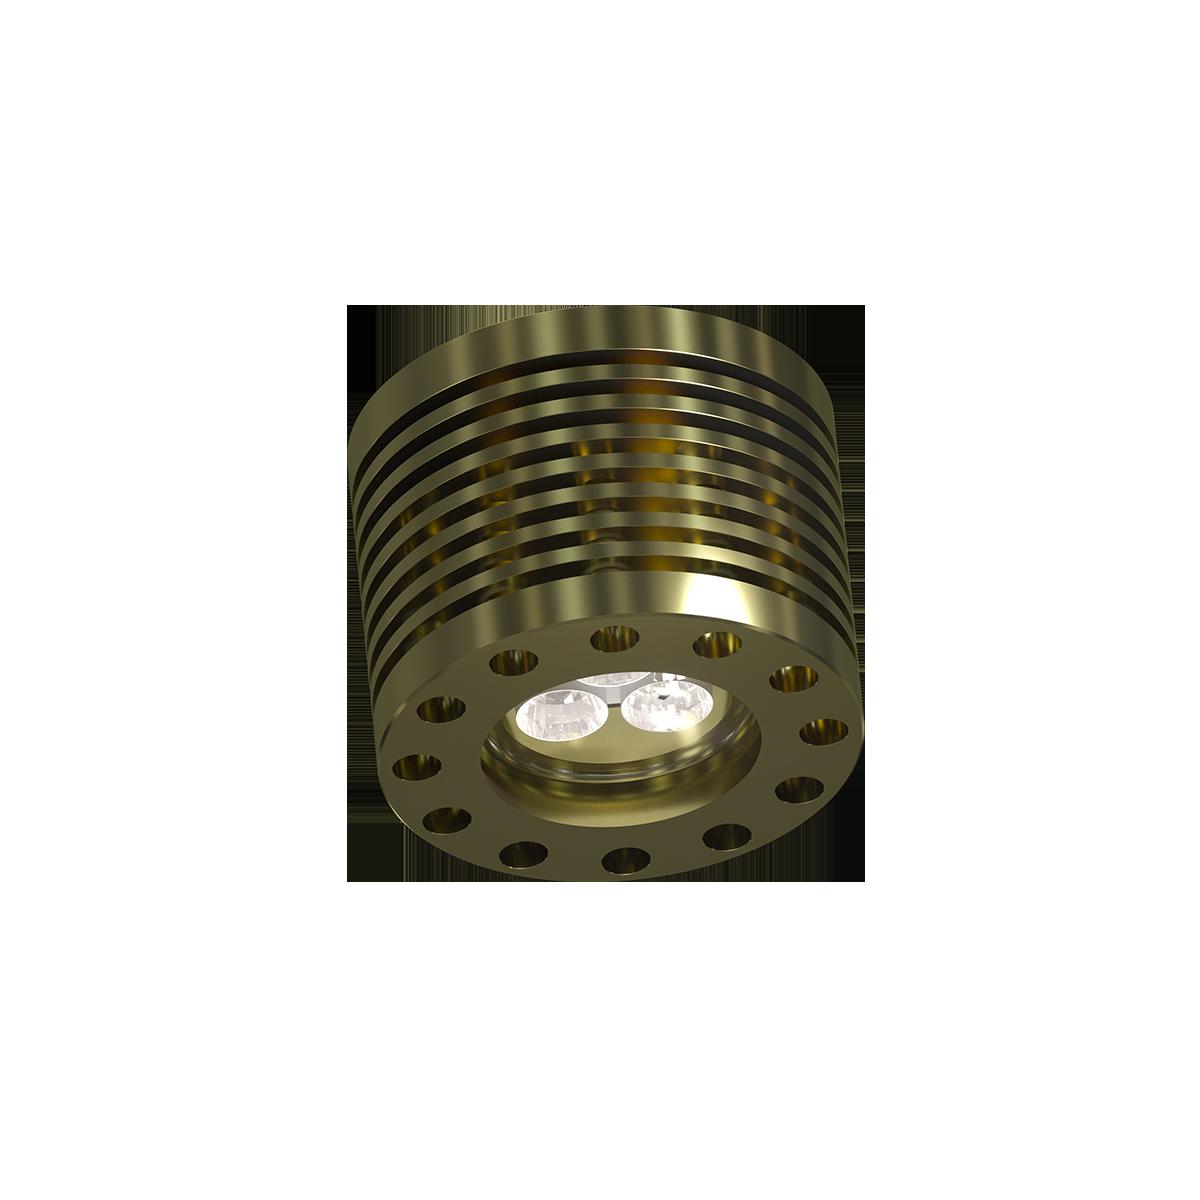 Компактный прожектор TRIF POINT IN